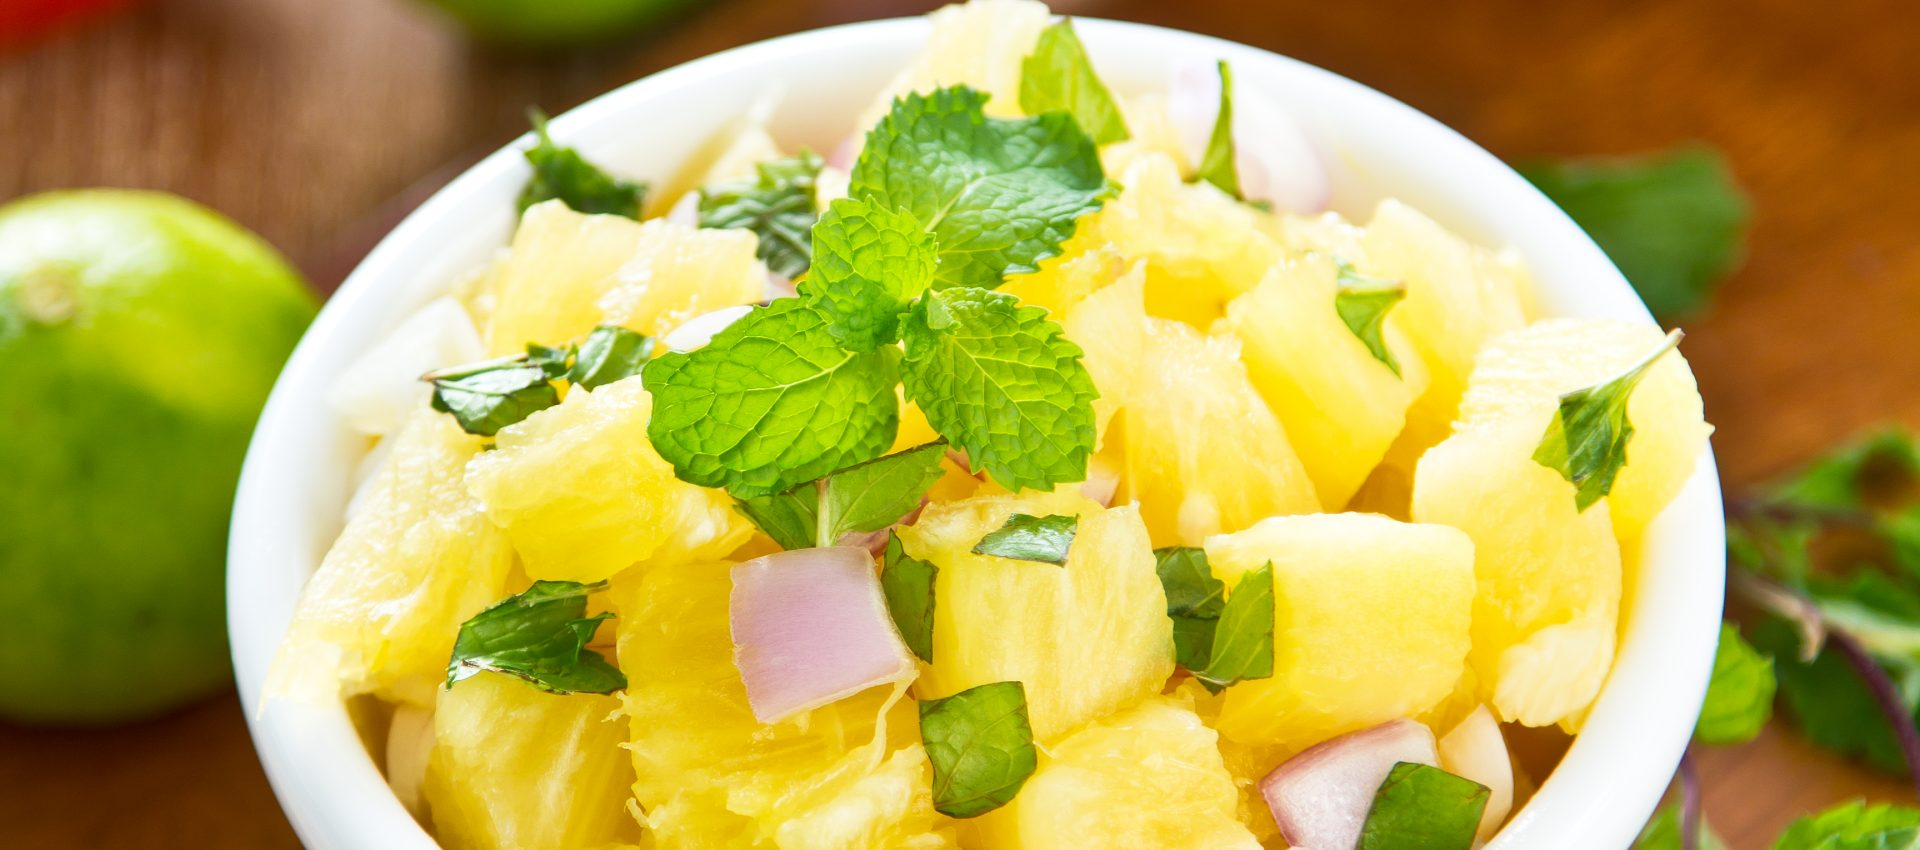 Ananas au sirop au cookeo